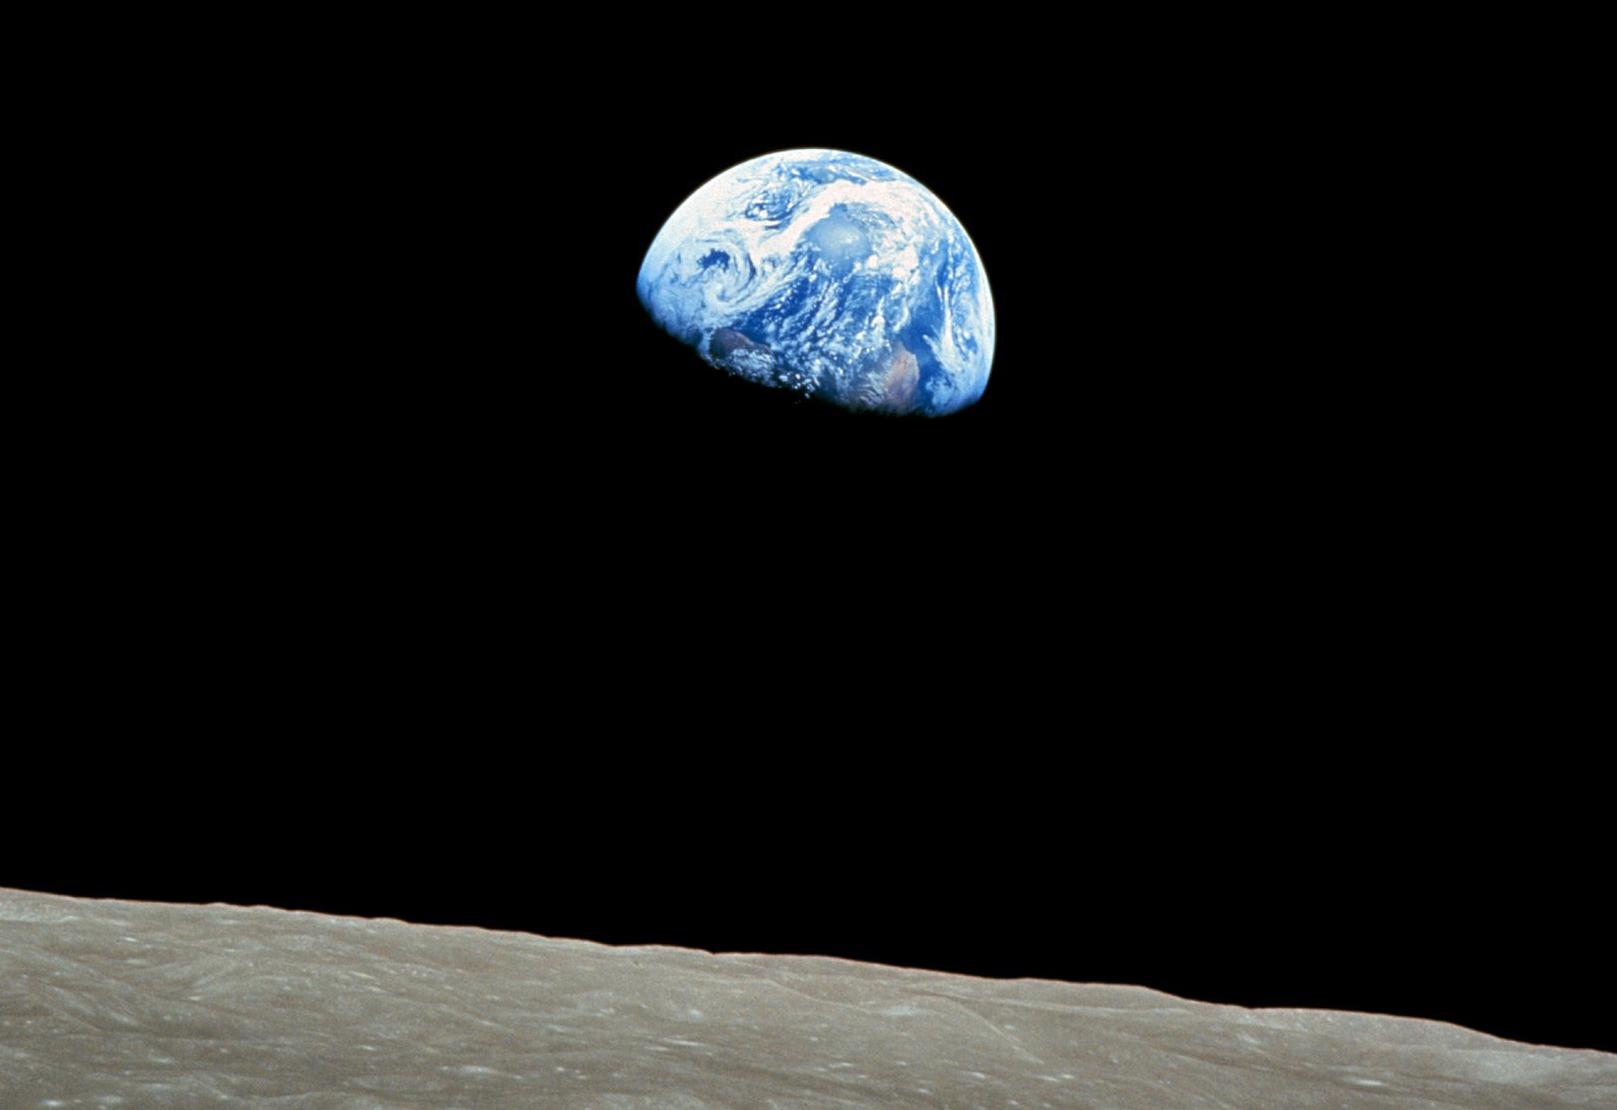 apollo 8 earthrise over moon - photo #10